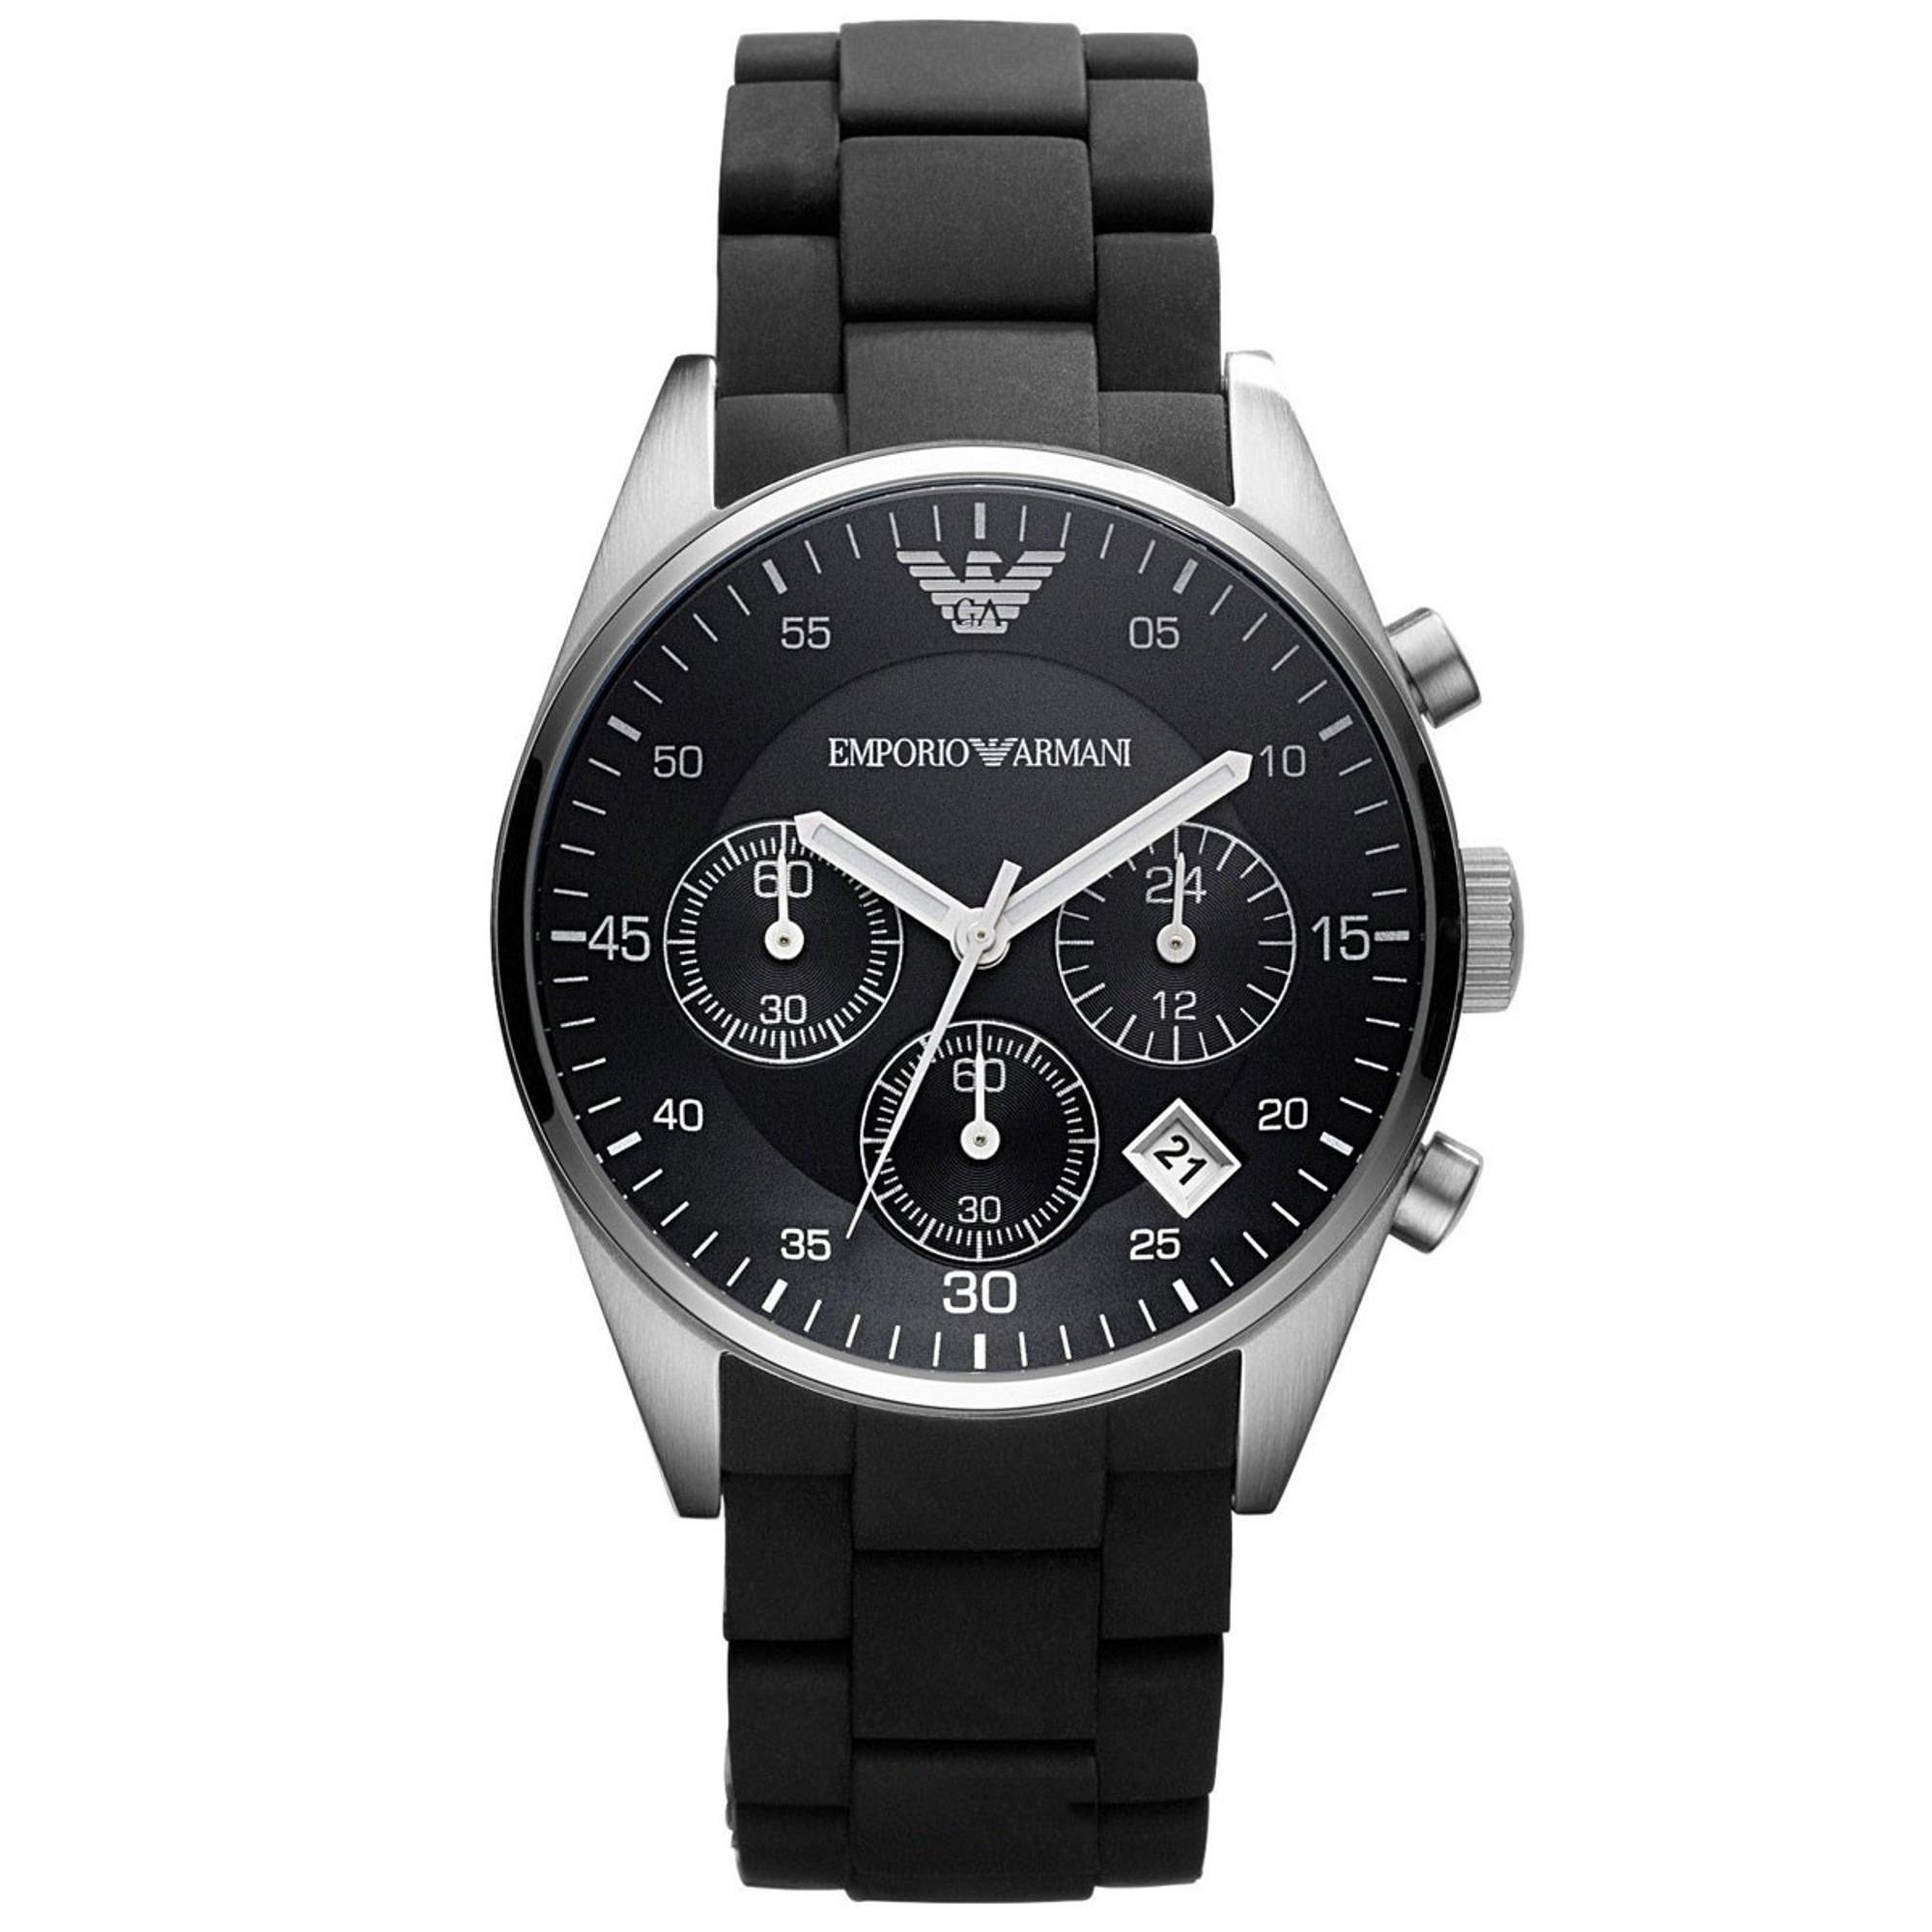 EMPORIO ARMANI Sportivo Watch Chronograph AR5868